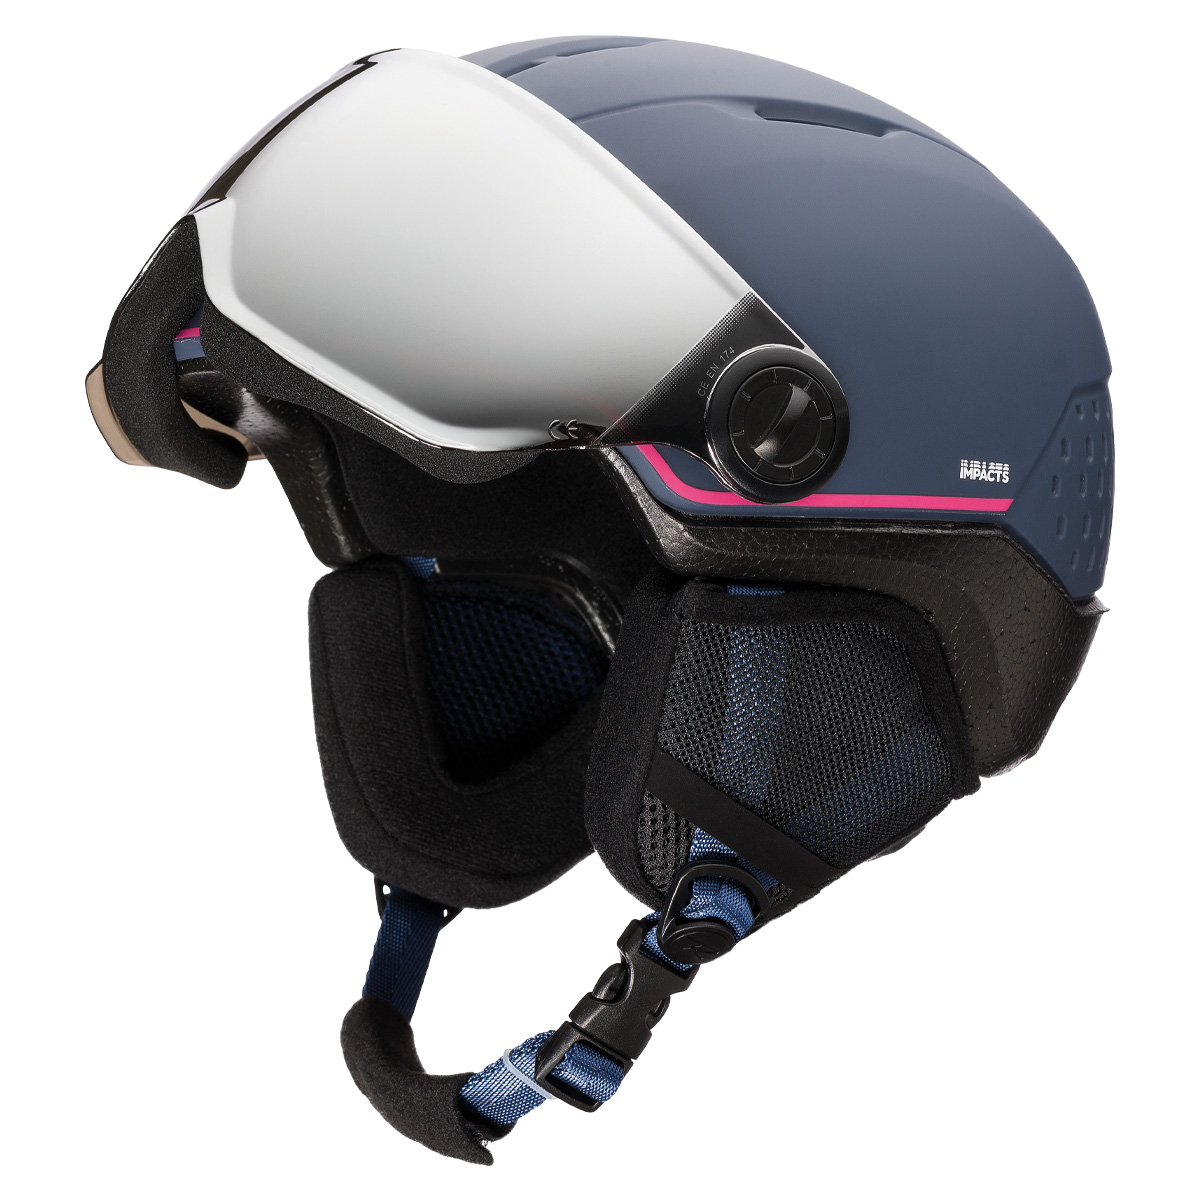 Casco sci Rossignol Whoopee Visor Impacts (Colore: blu-pink, Taglia: 52/55.5)